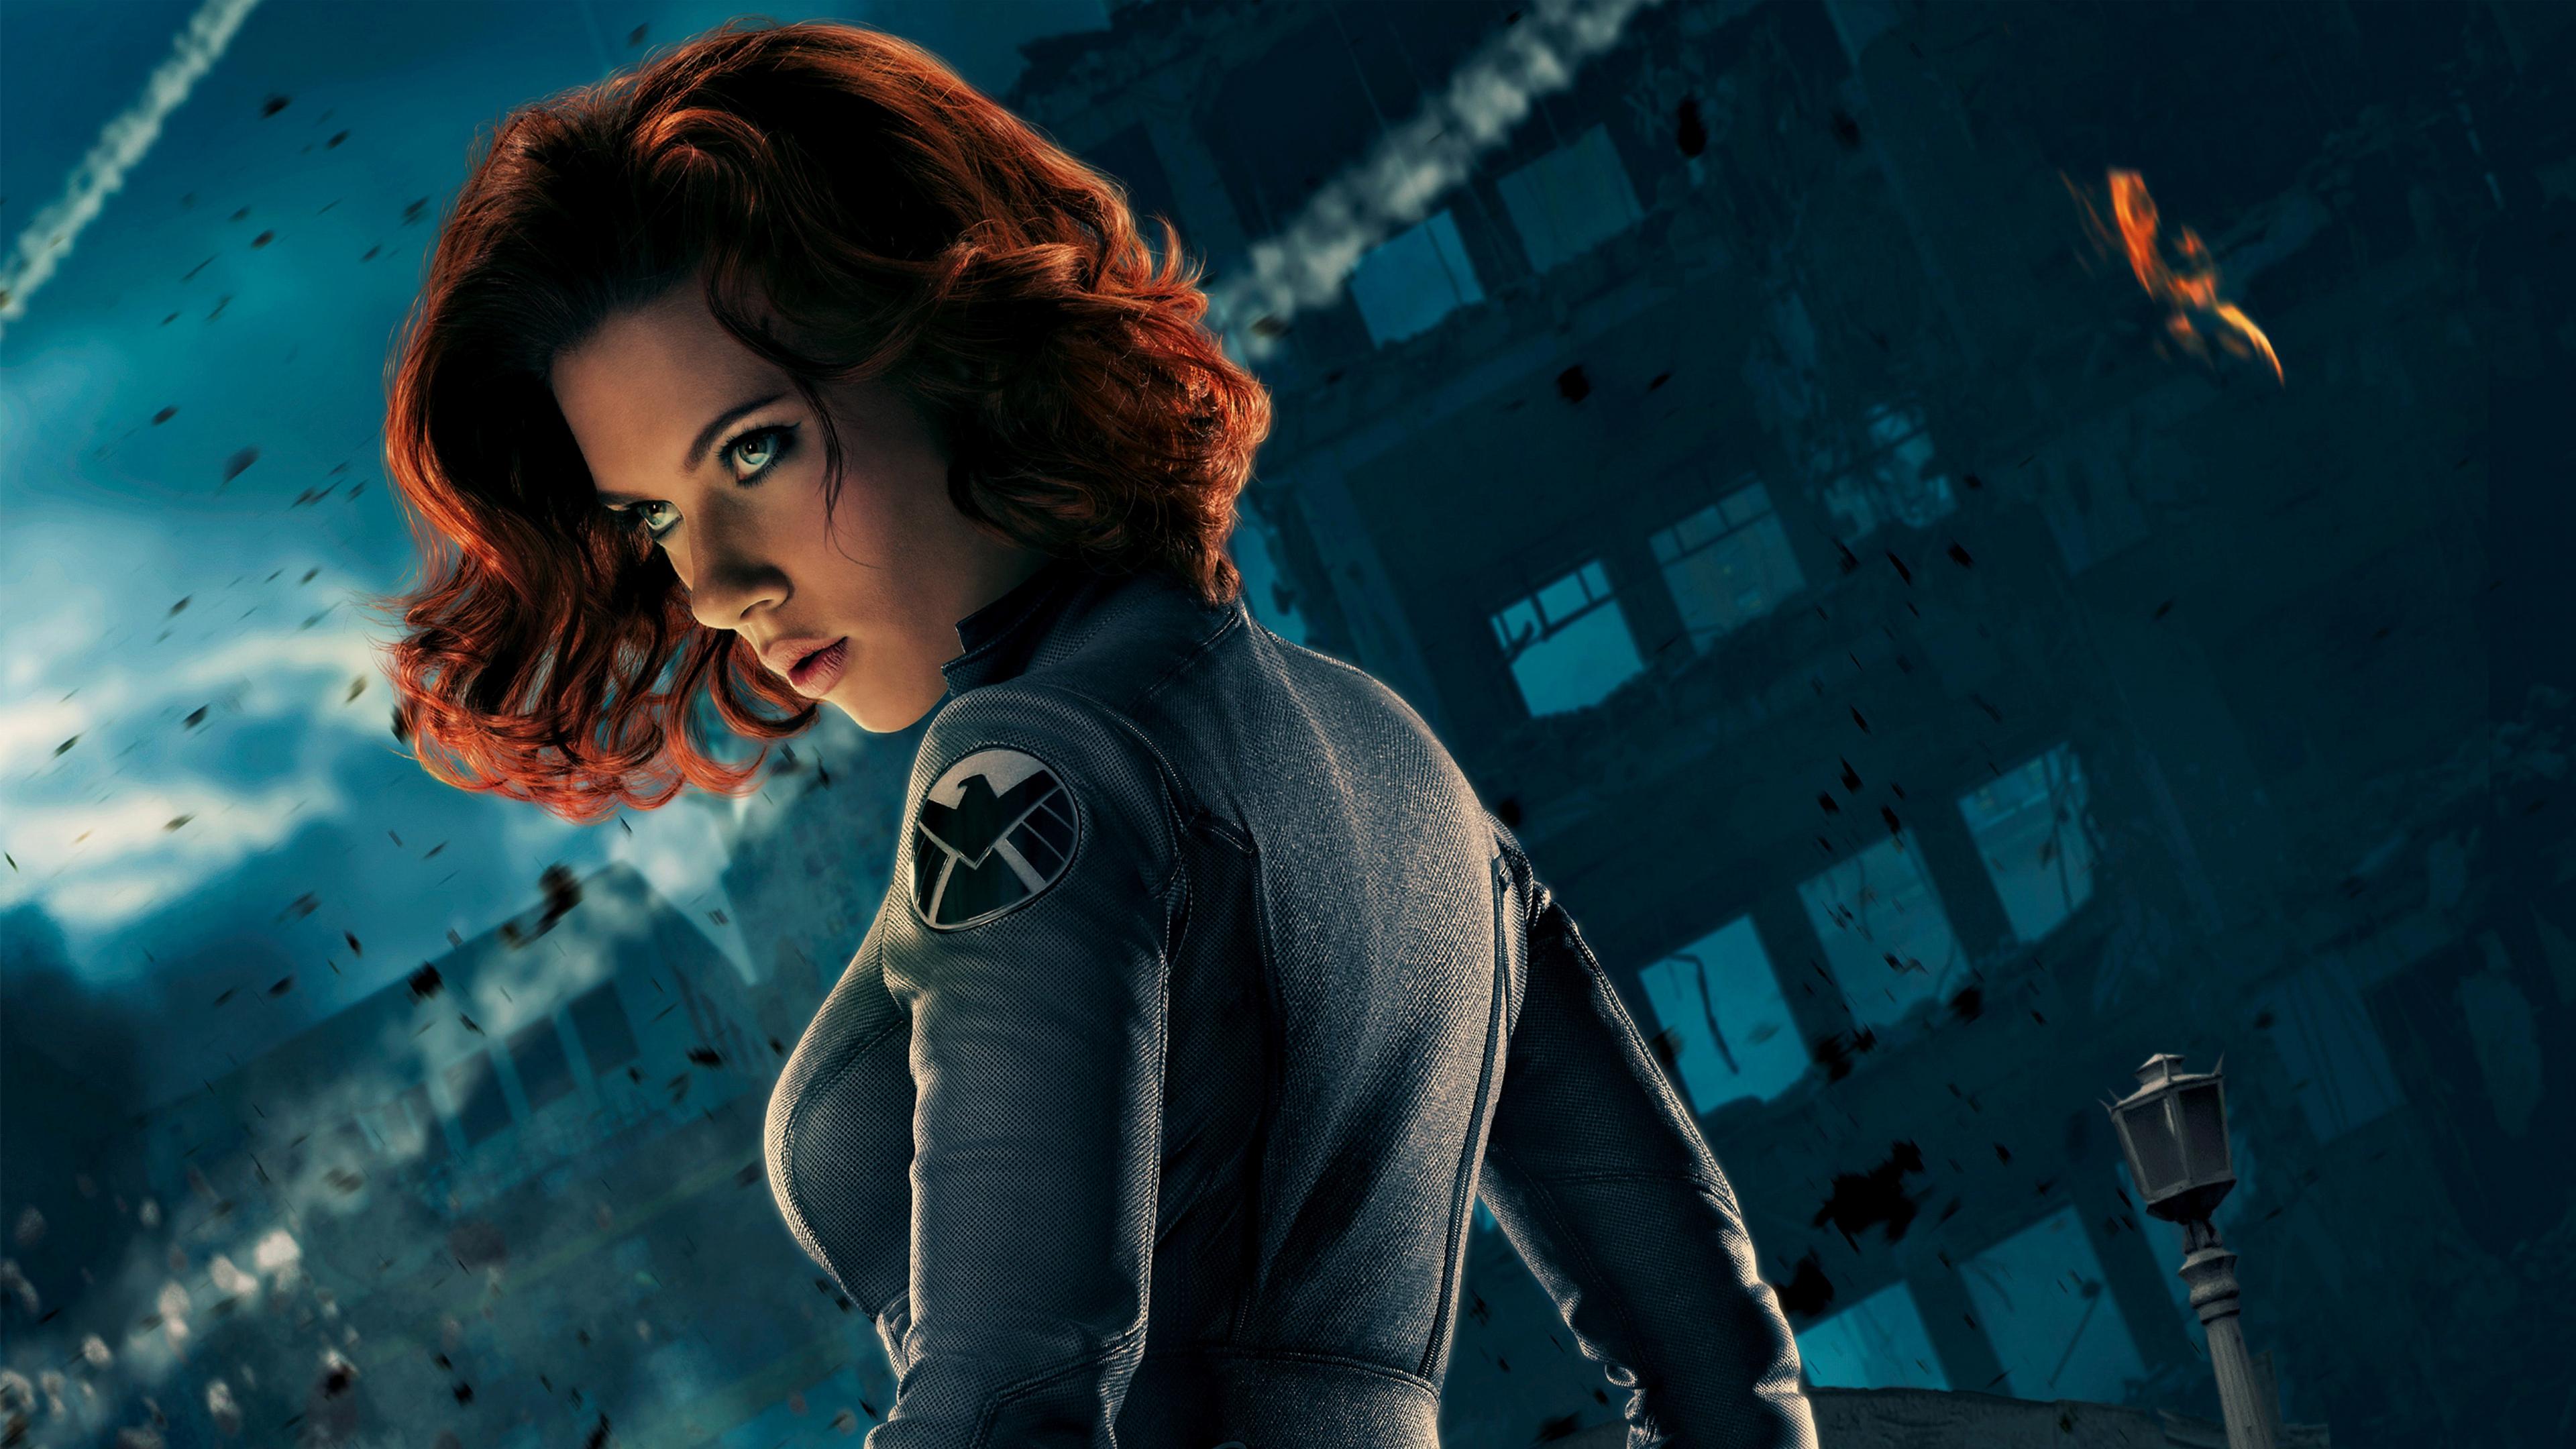 Download 3840x2160 Wallpaper Scarlett Johansson Red Head As Black Widow 4 K Uhd 16 9 Widescreen 3840x2160 Hd Image Background 16551